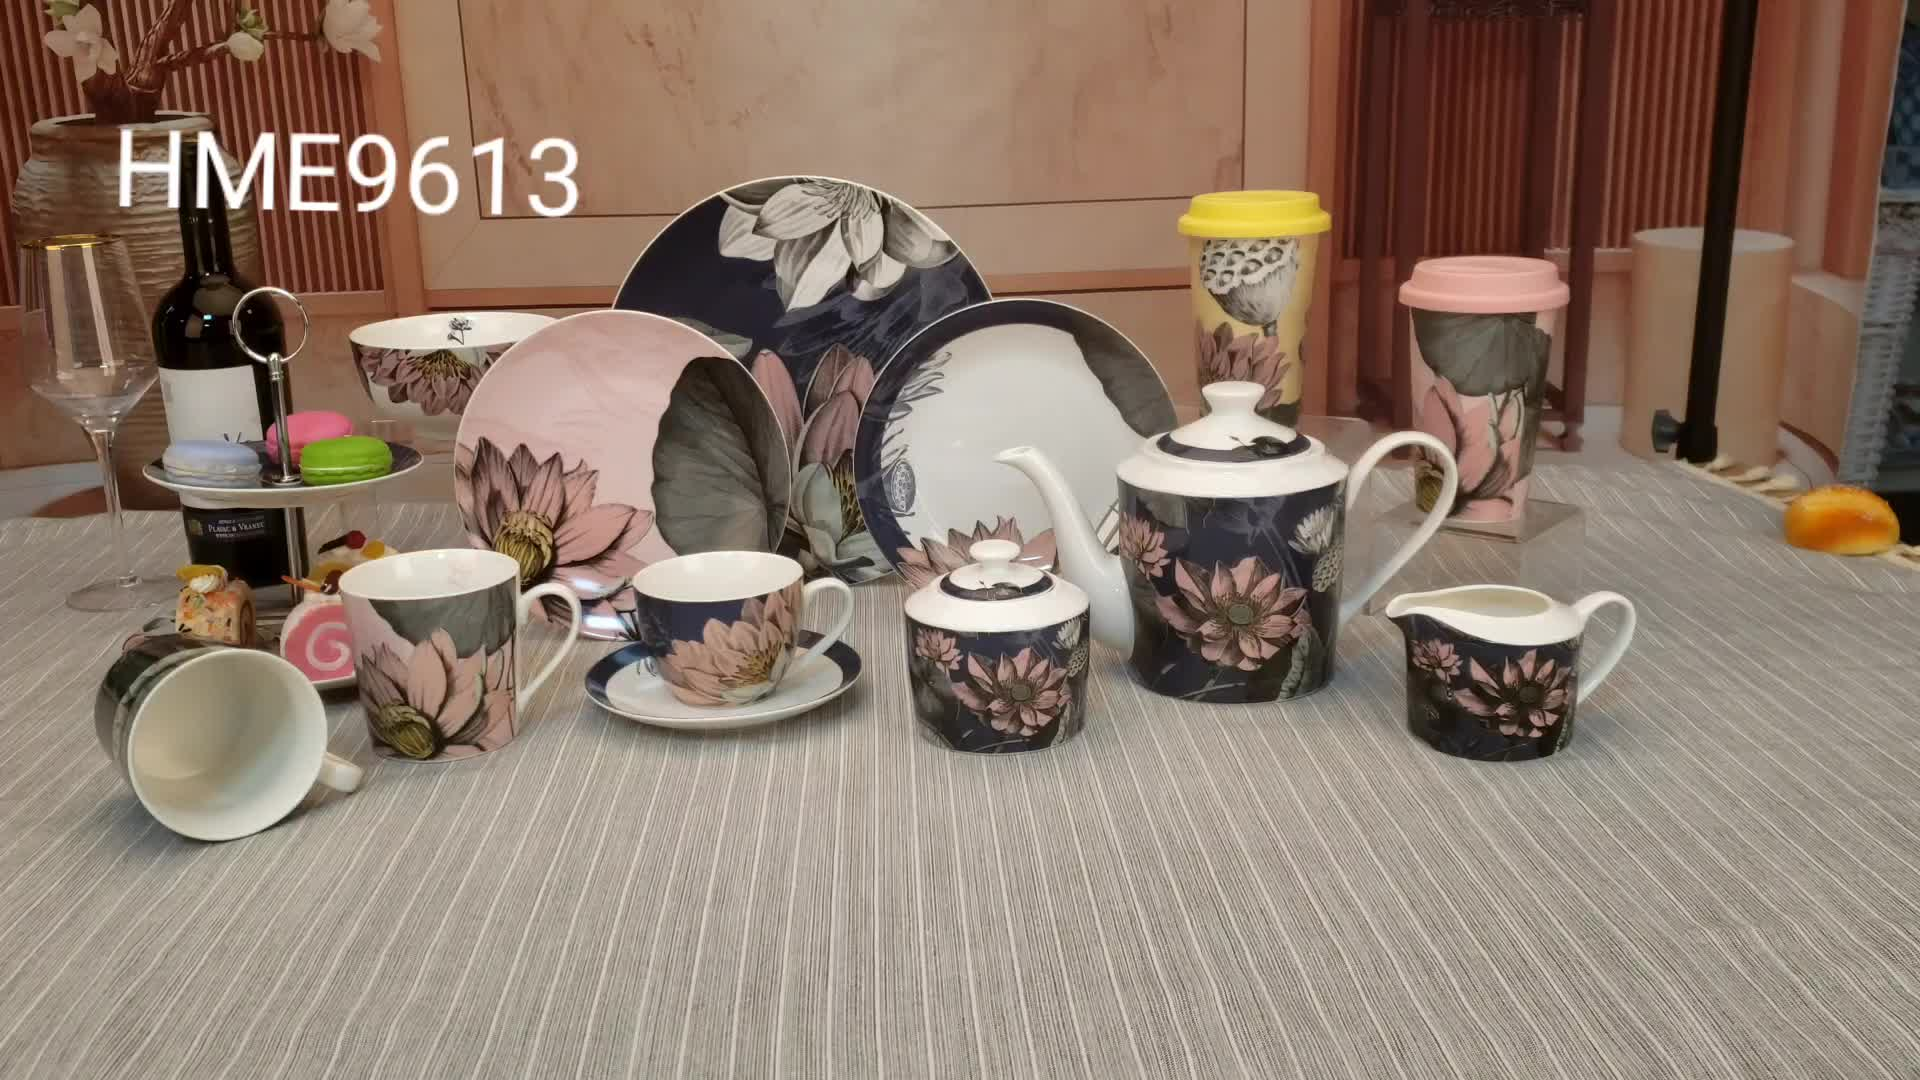 Vendita calda Inglese botanico rustico porcellana da tavola in ceramica piatti